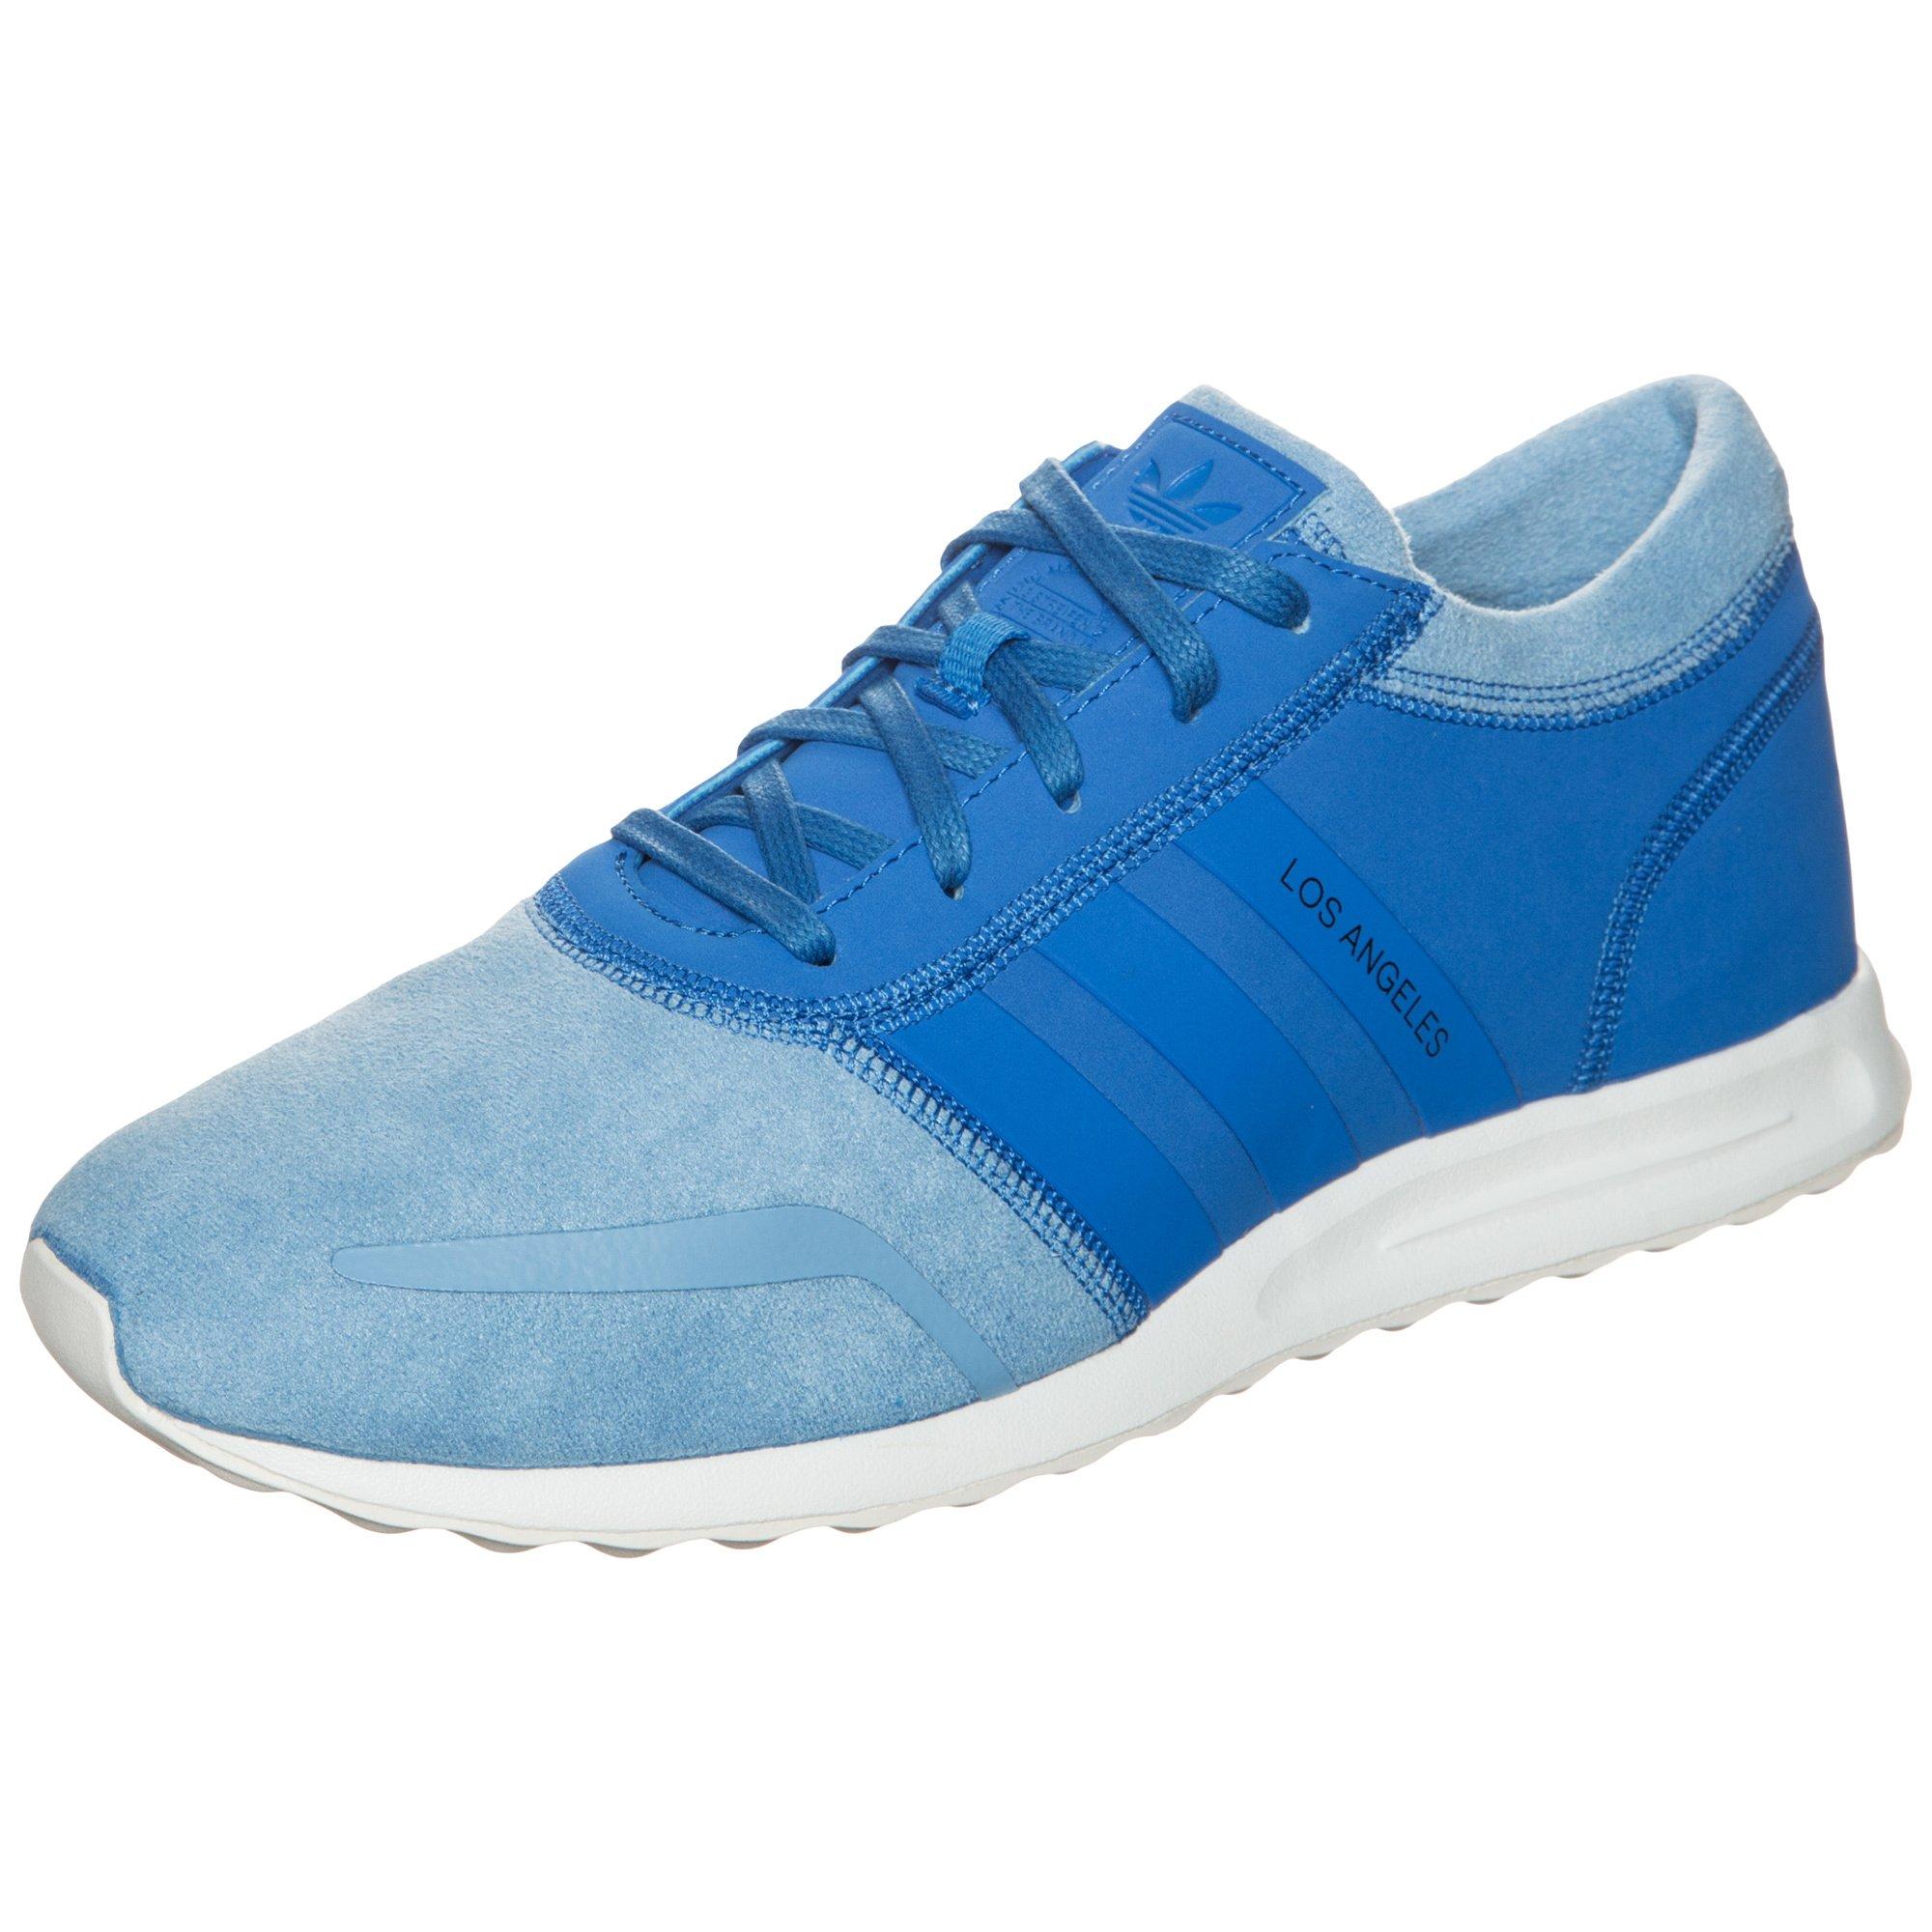 7a171ca5c84d46 adidas Originals Los Angeles Schuhe Herren Sneaker Turnschuhe Blau AQ2594